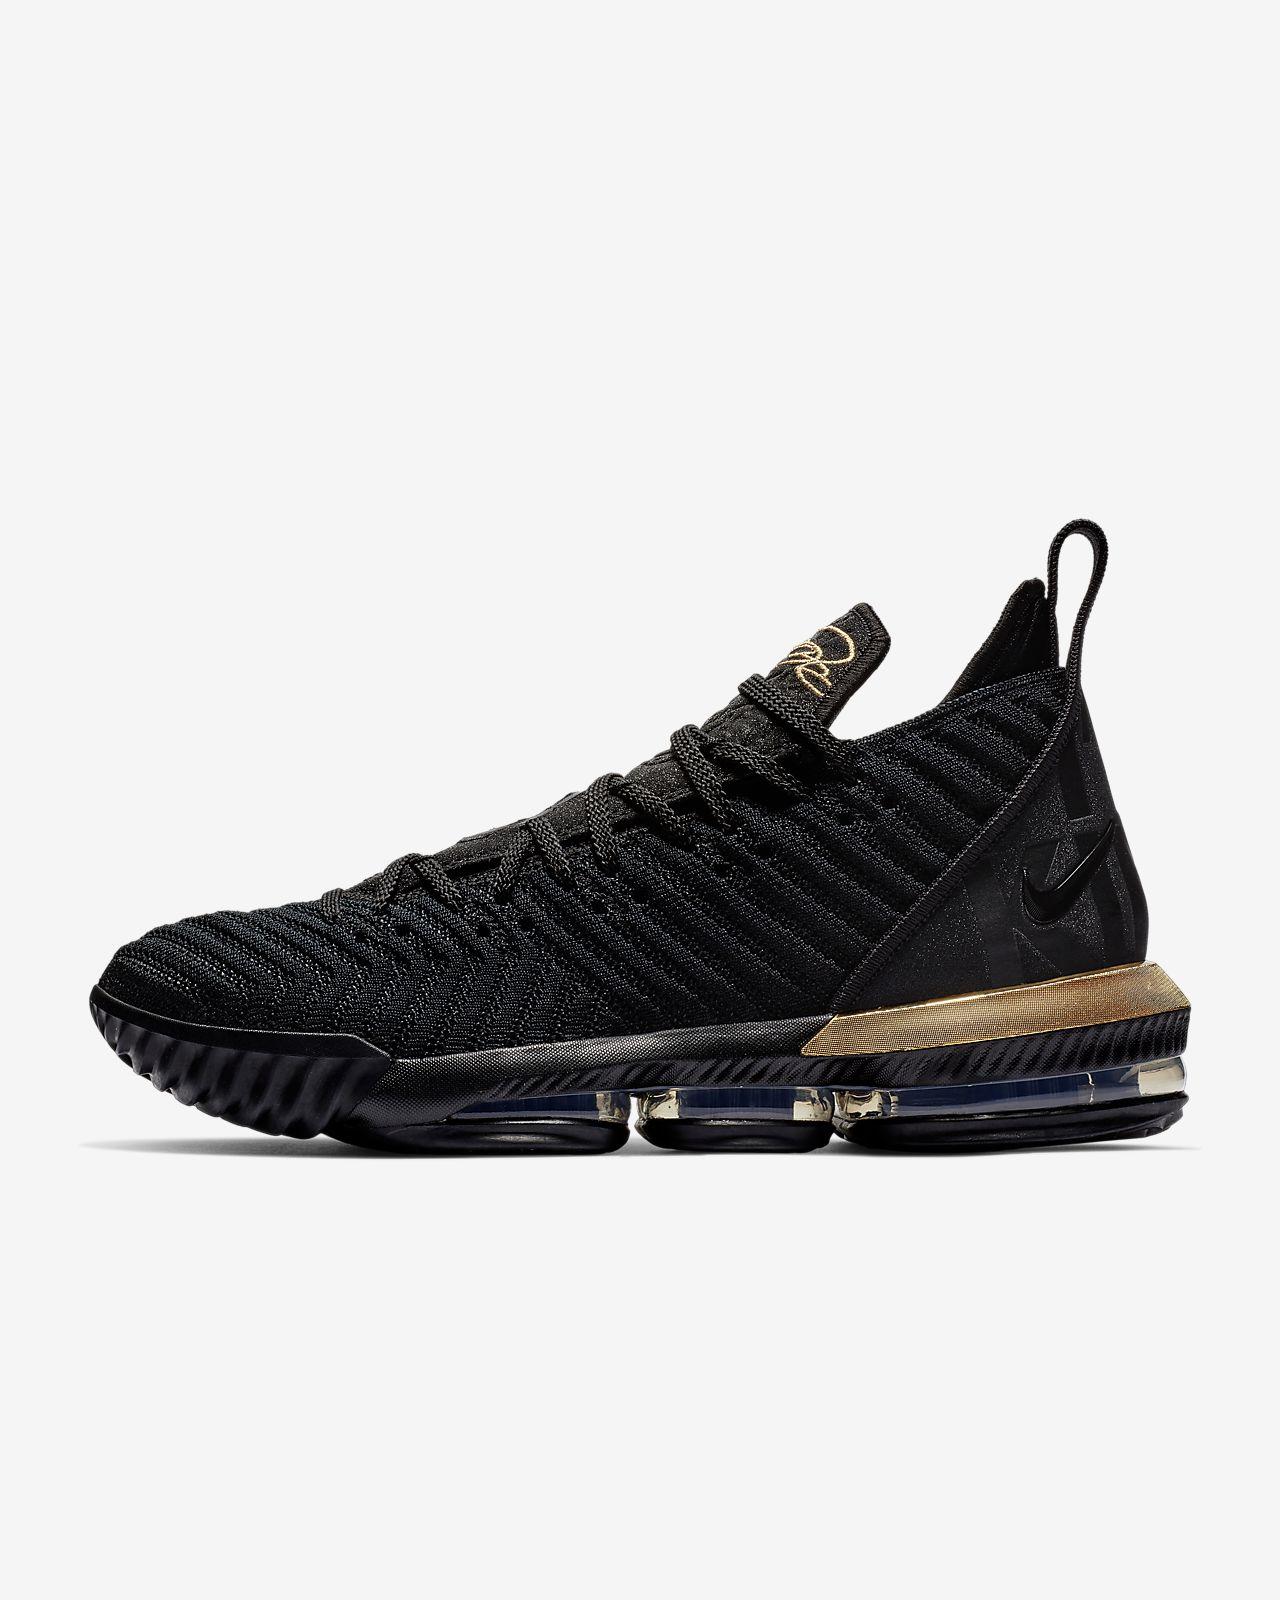 lebron 16 nike shoes